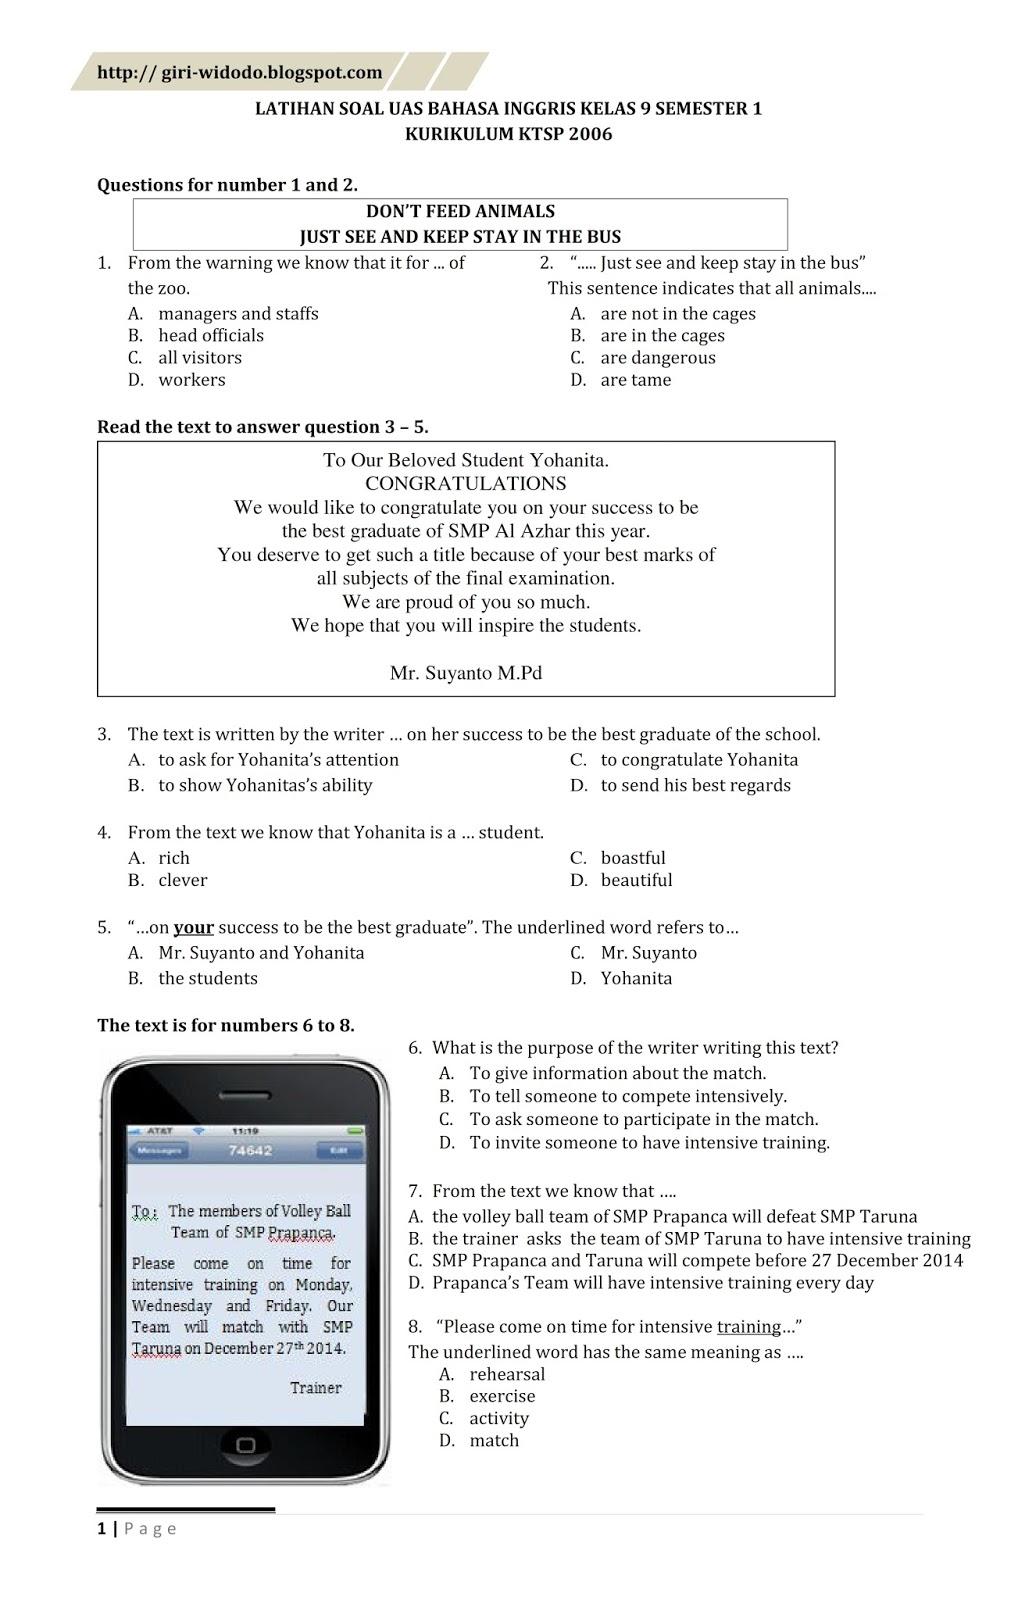 Soal Uas Bahasa Indonesia Kelas 9 Semester 1 Kurikulum 2013 : bahasa, indonesia, kelas, semester, kurikulum, Bahasa, Inggris, Kelas, Seputar